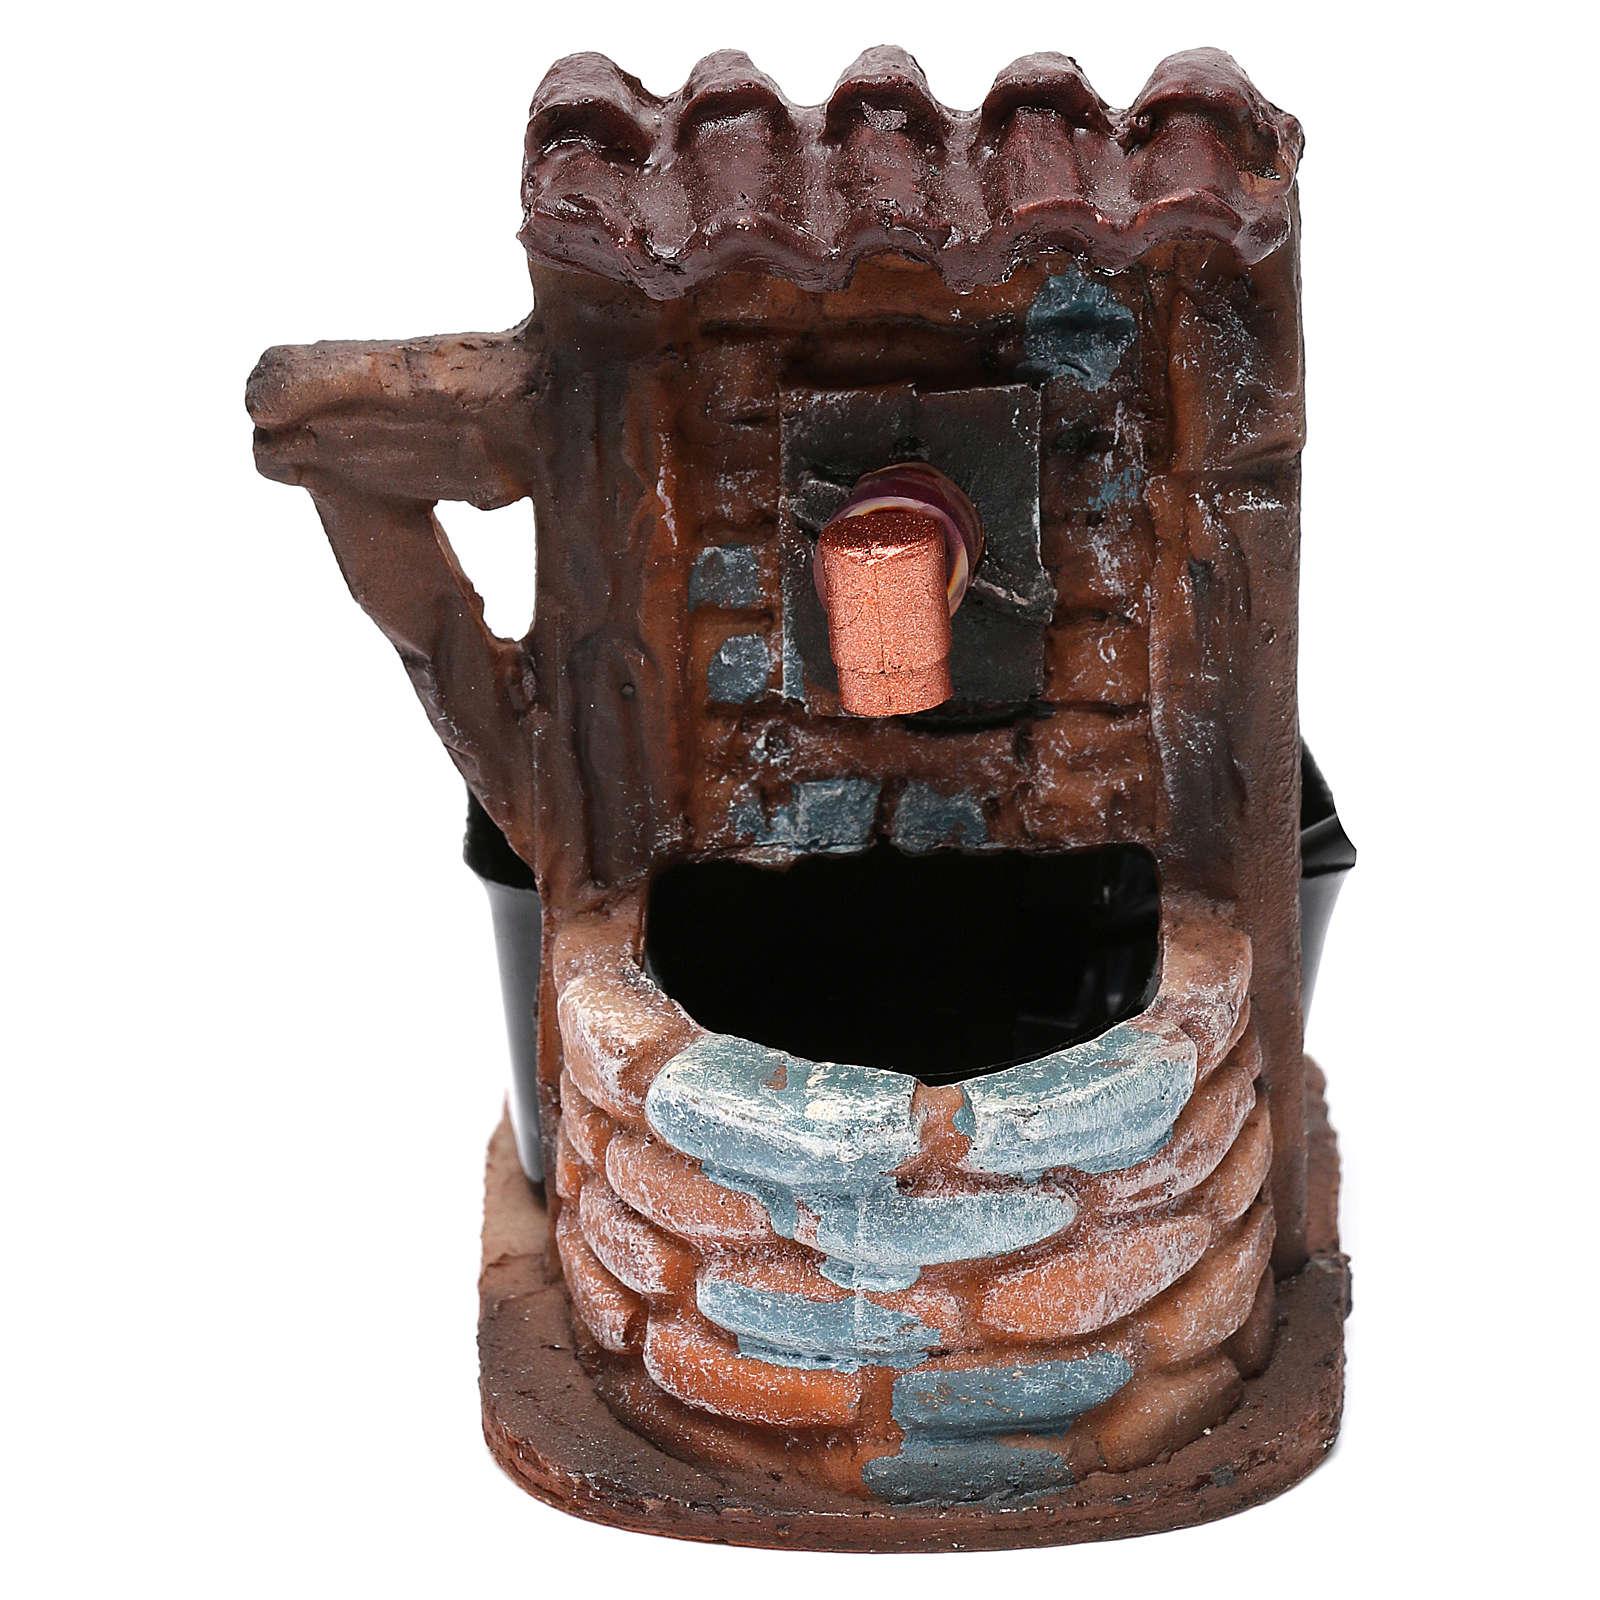 Chafariz tijolos com bomba 9x7x10 cm 4